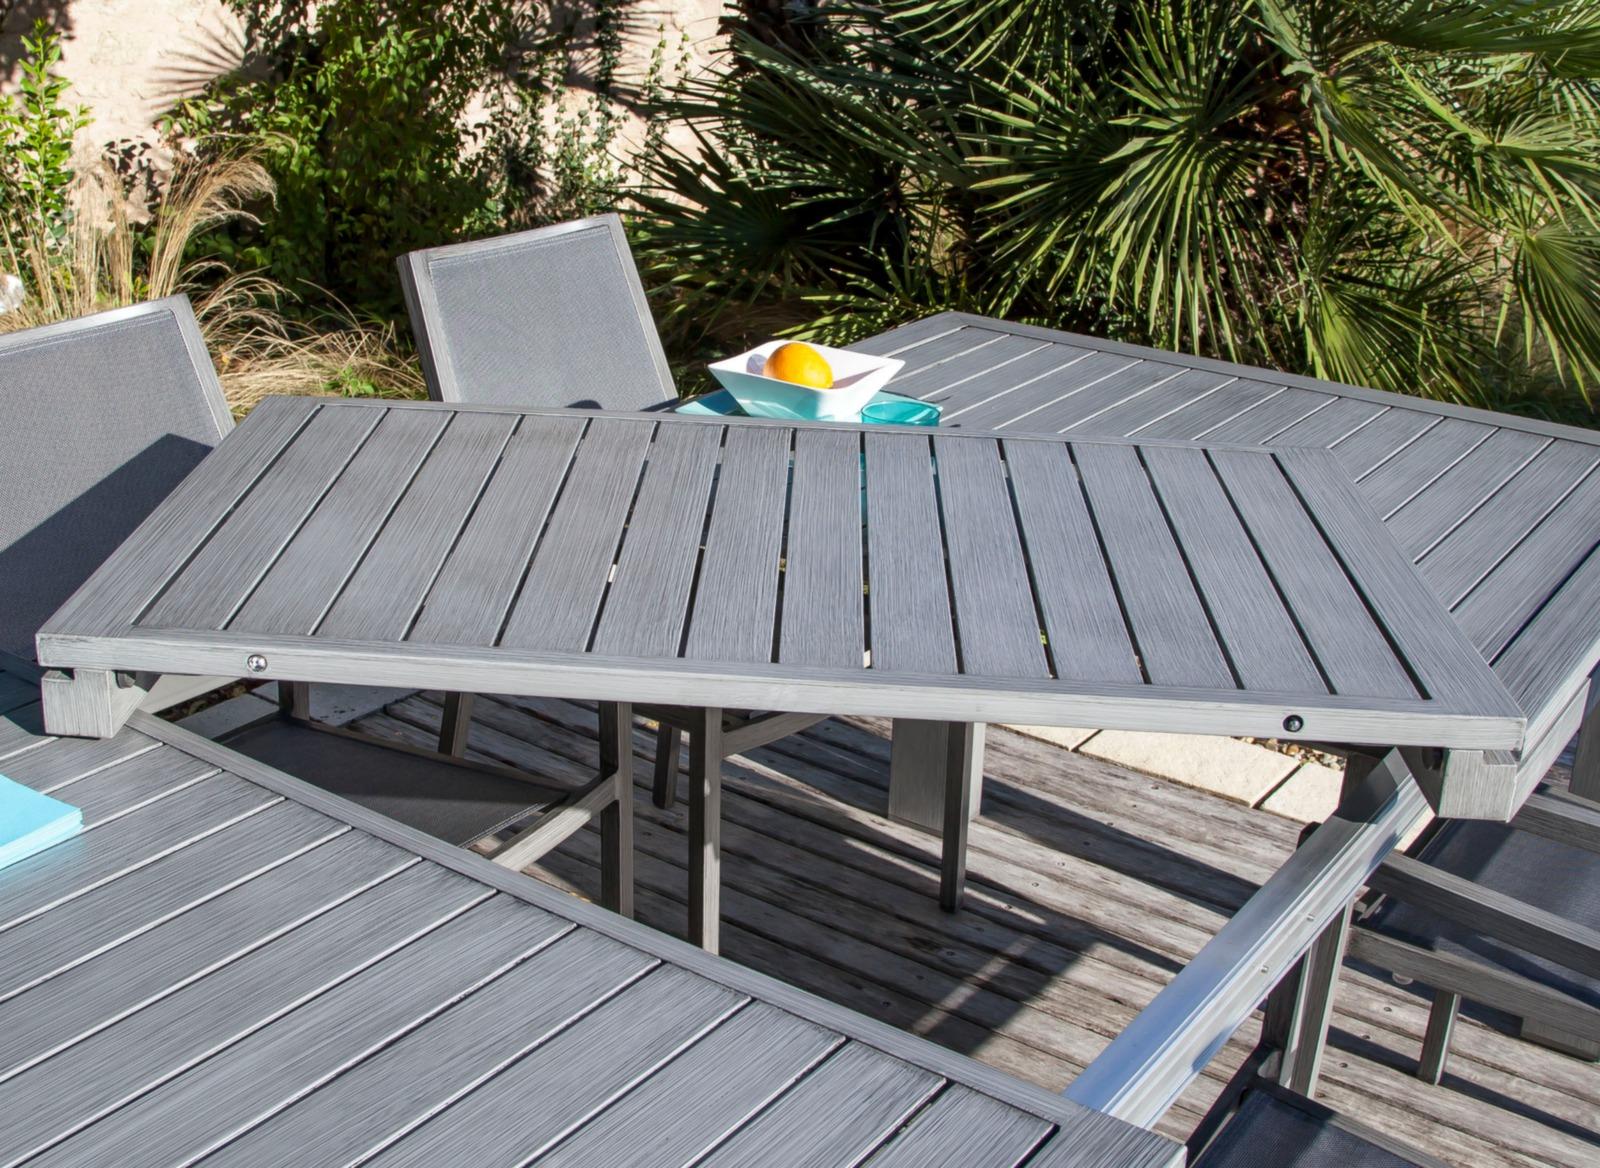 salon de jardin avec grande table promotion proloisirs. Black Bedroom Furniture Sets. Home Design Ideas